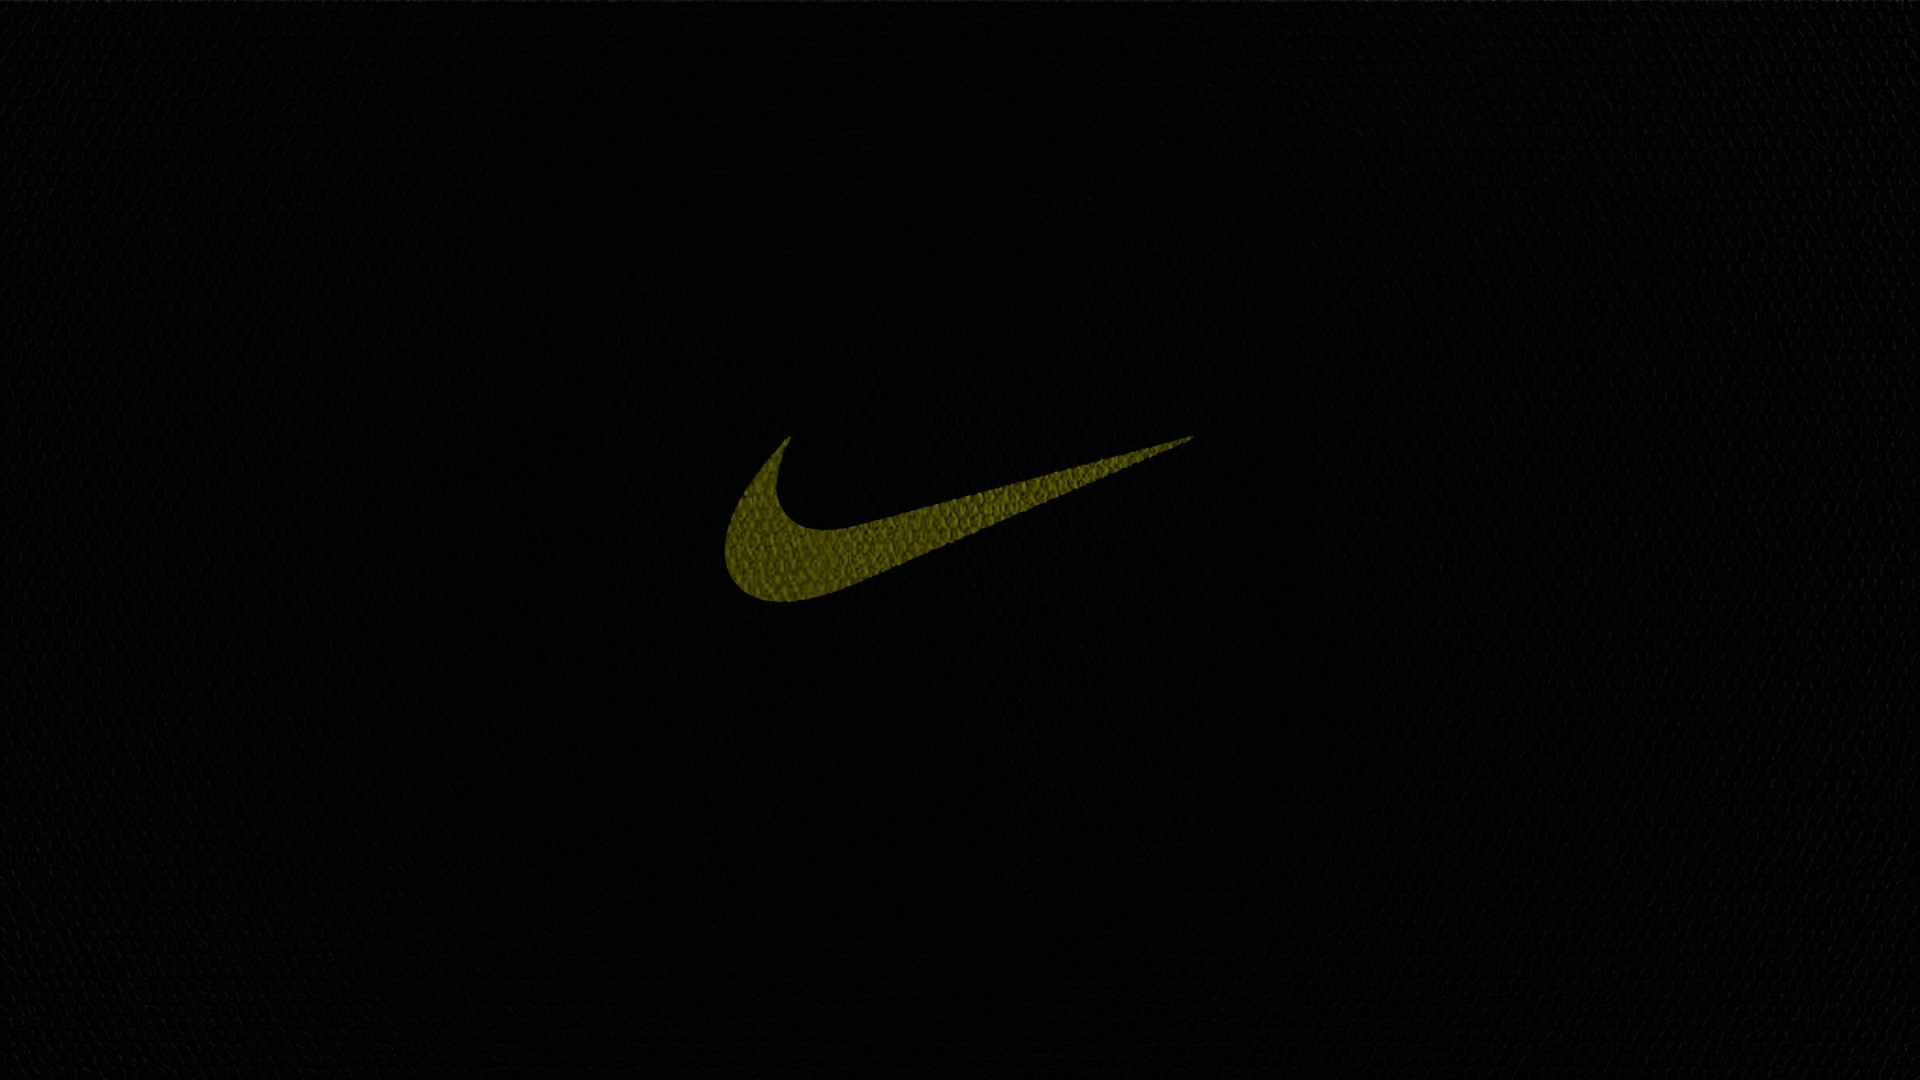 Nike Wallpaper Hd wallpaper   1390791 1920x1080